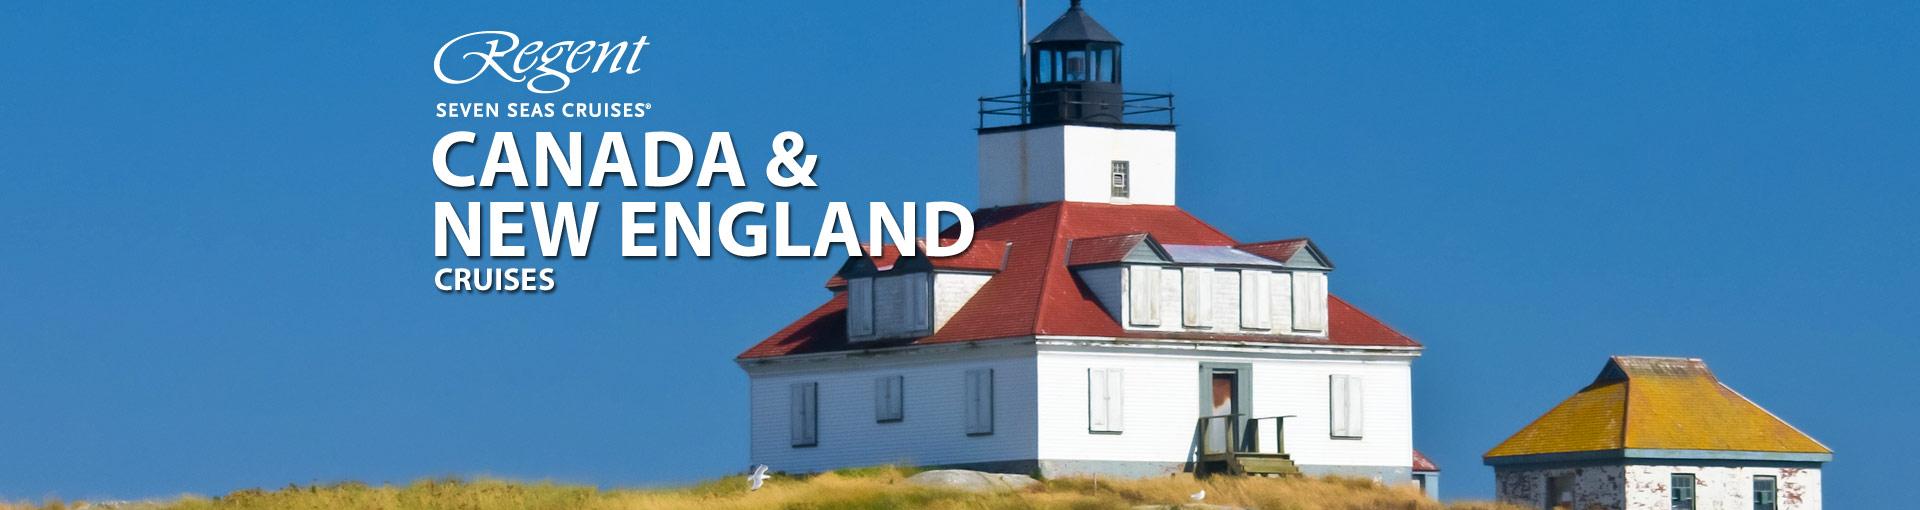 Regent Seven Seas Cruises Canada New England Cru